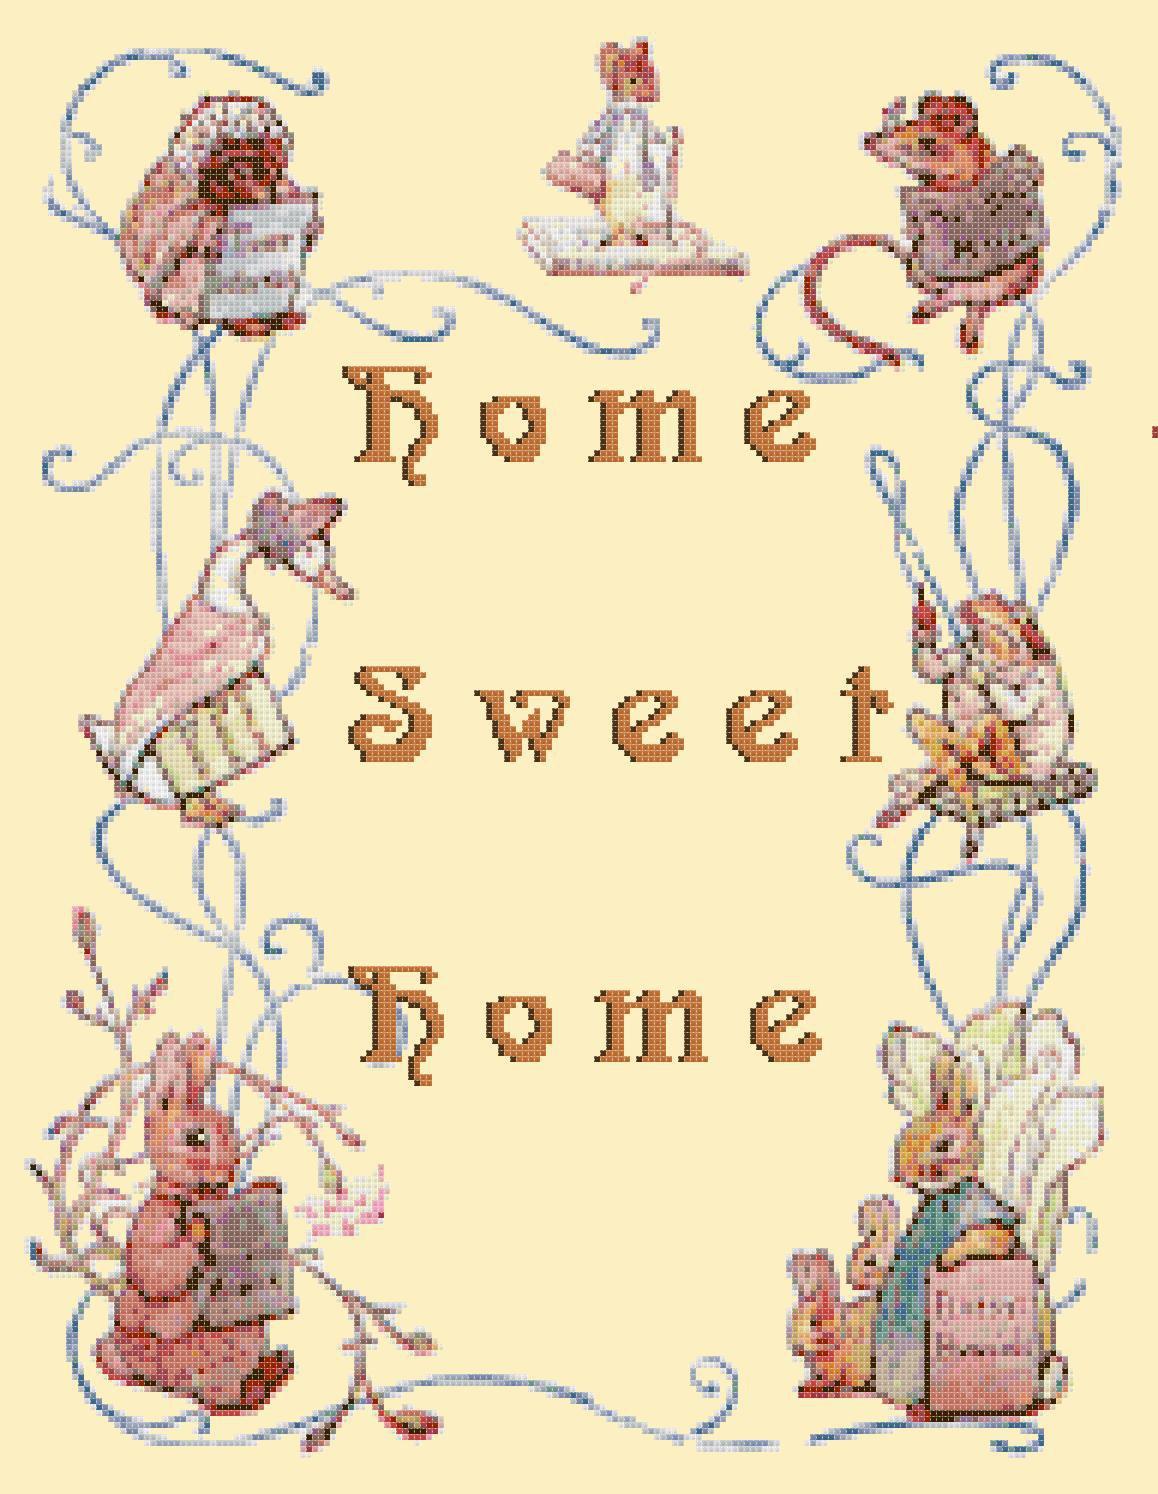 counted cross stitch pattern Home sweet home potter pdf 279x237 stitches E1241